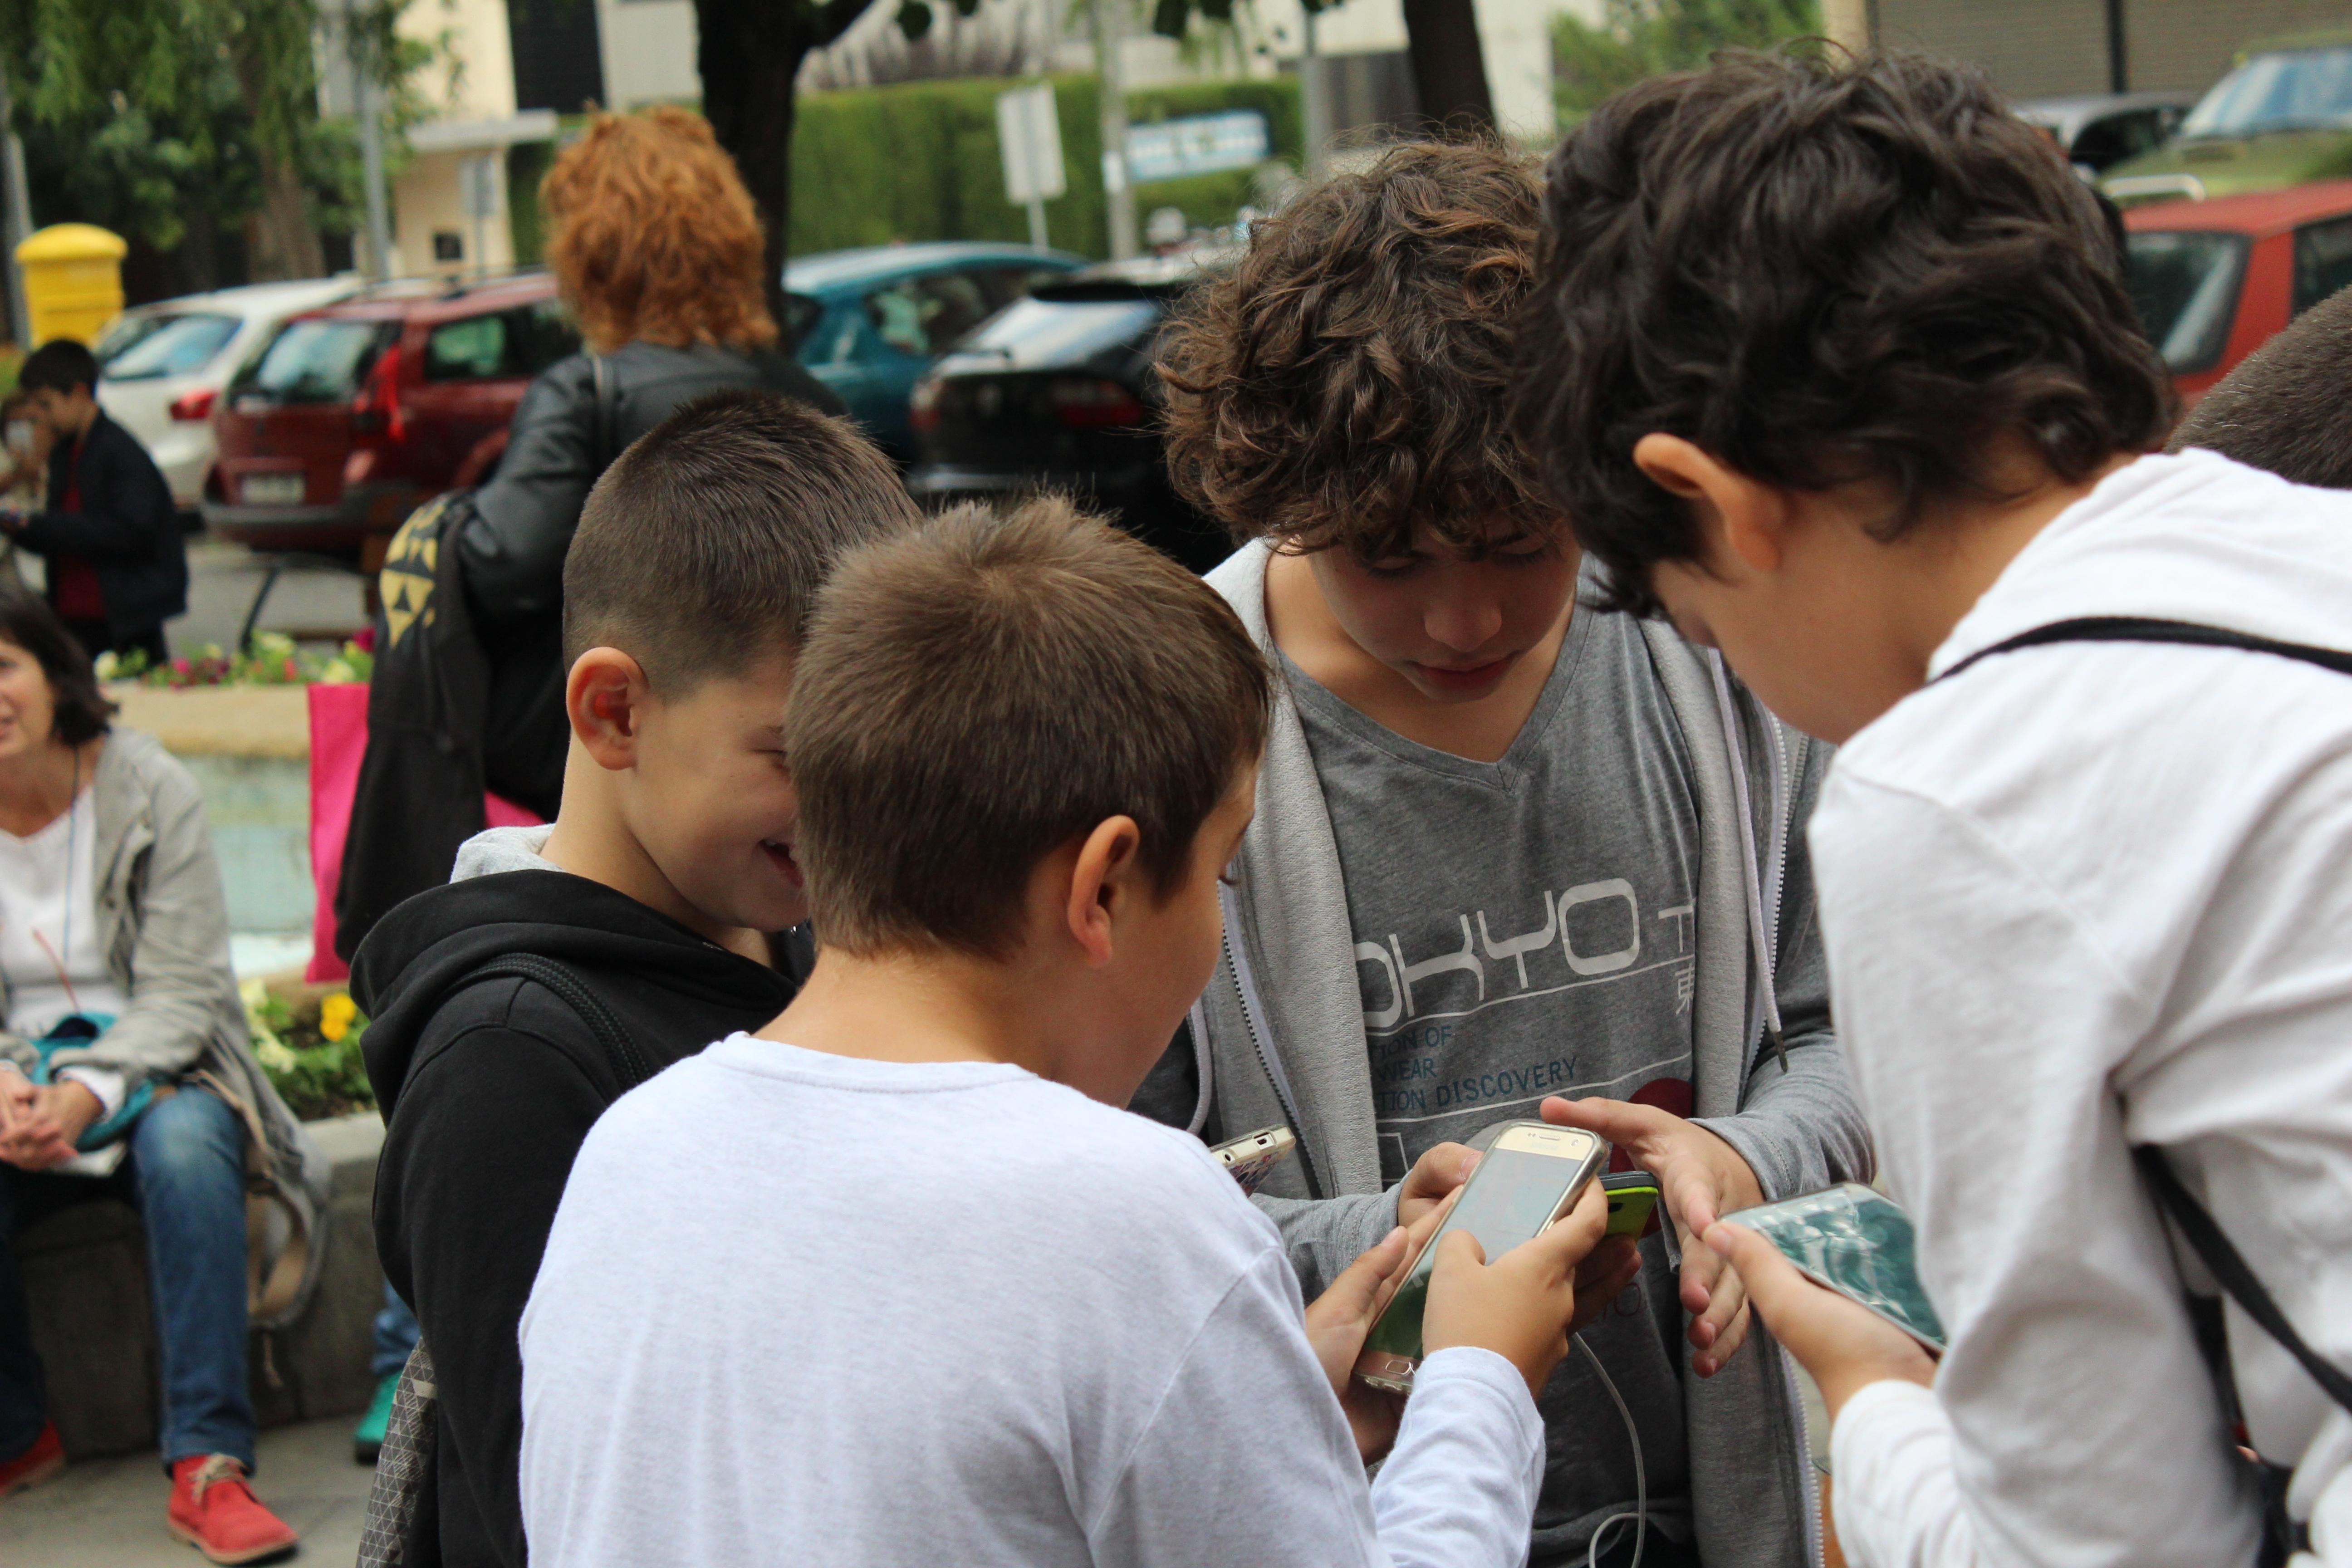 Éxito en la primera quedada Pokémon de Sant Andreu de la Barca